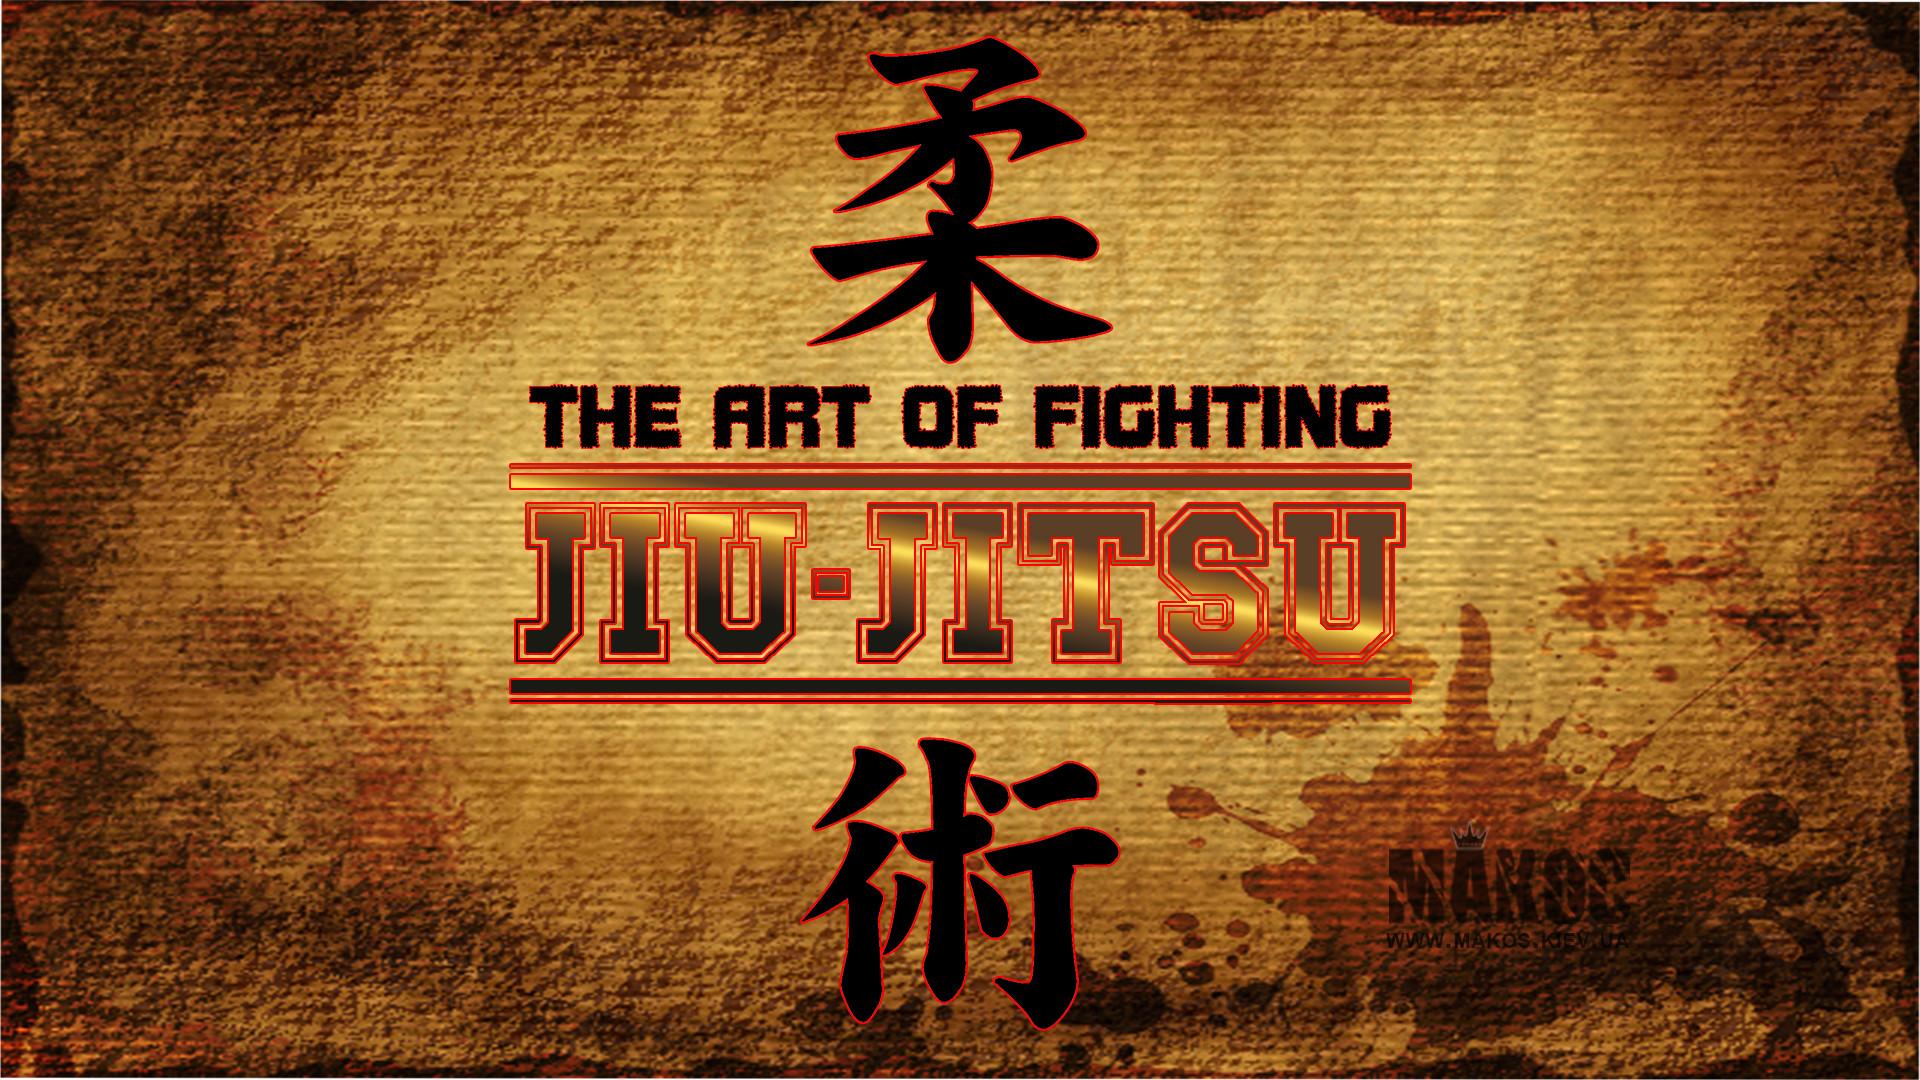 Jiu jitsu wallpapers jiu voltagebd Image collections